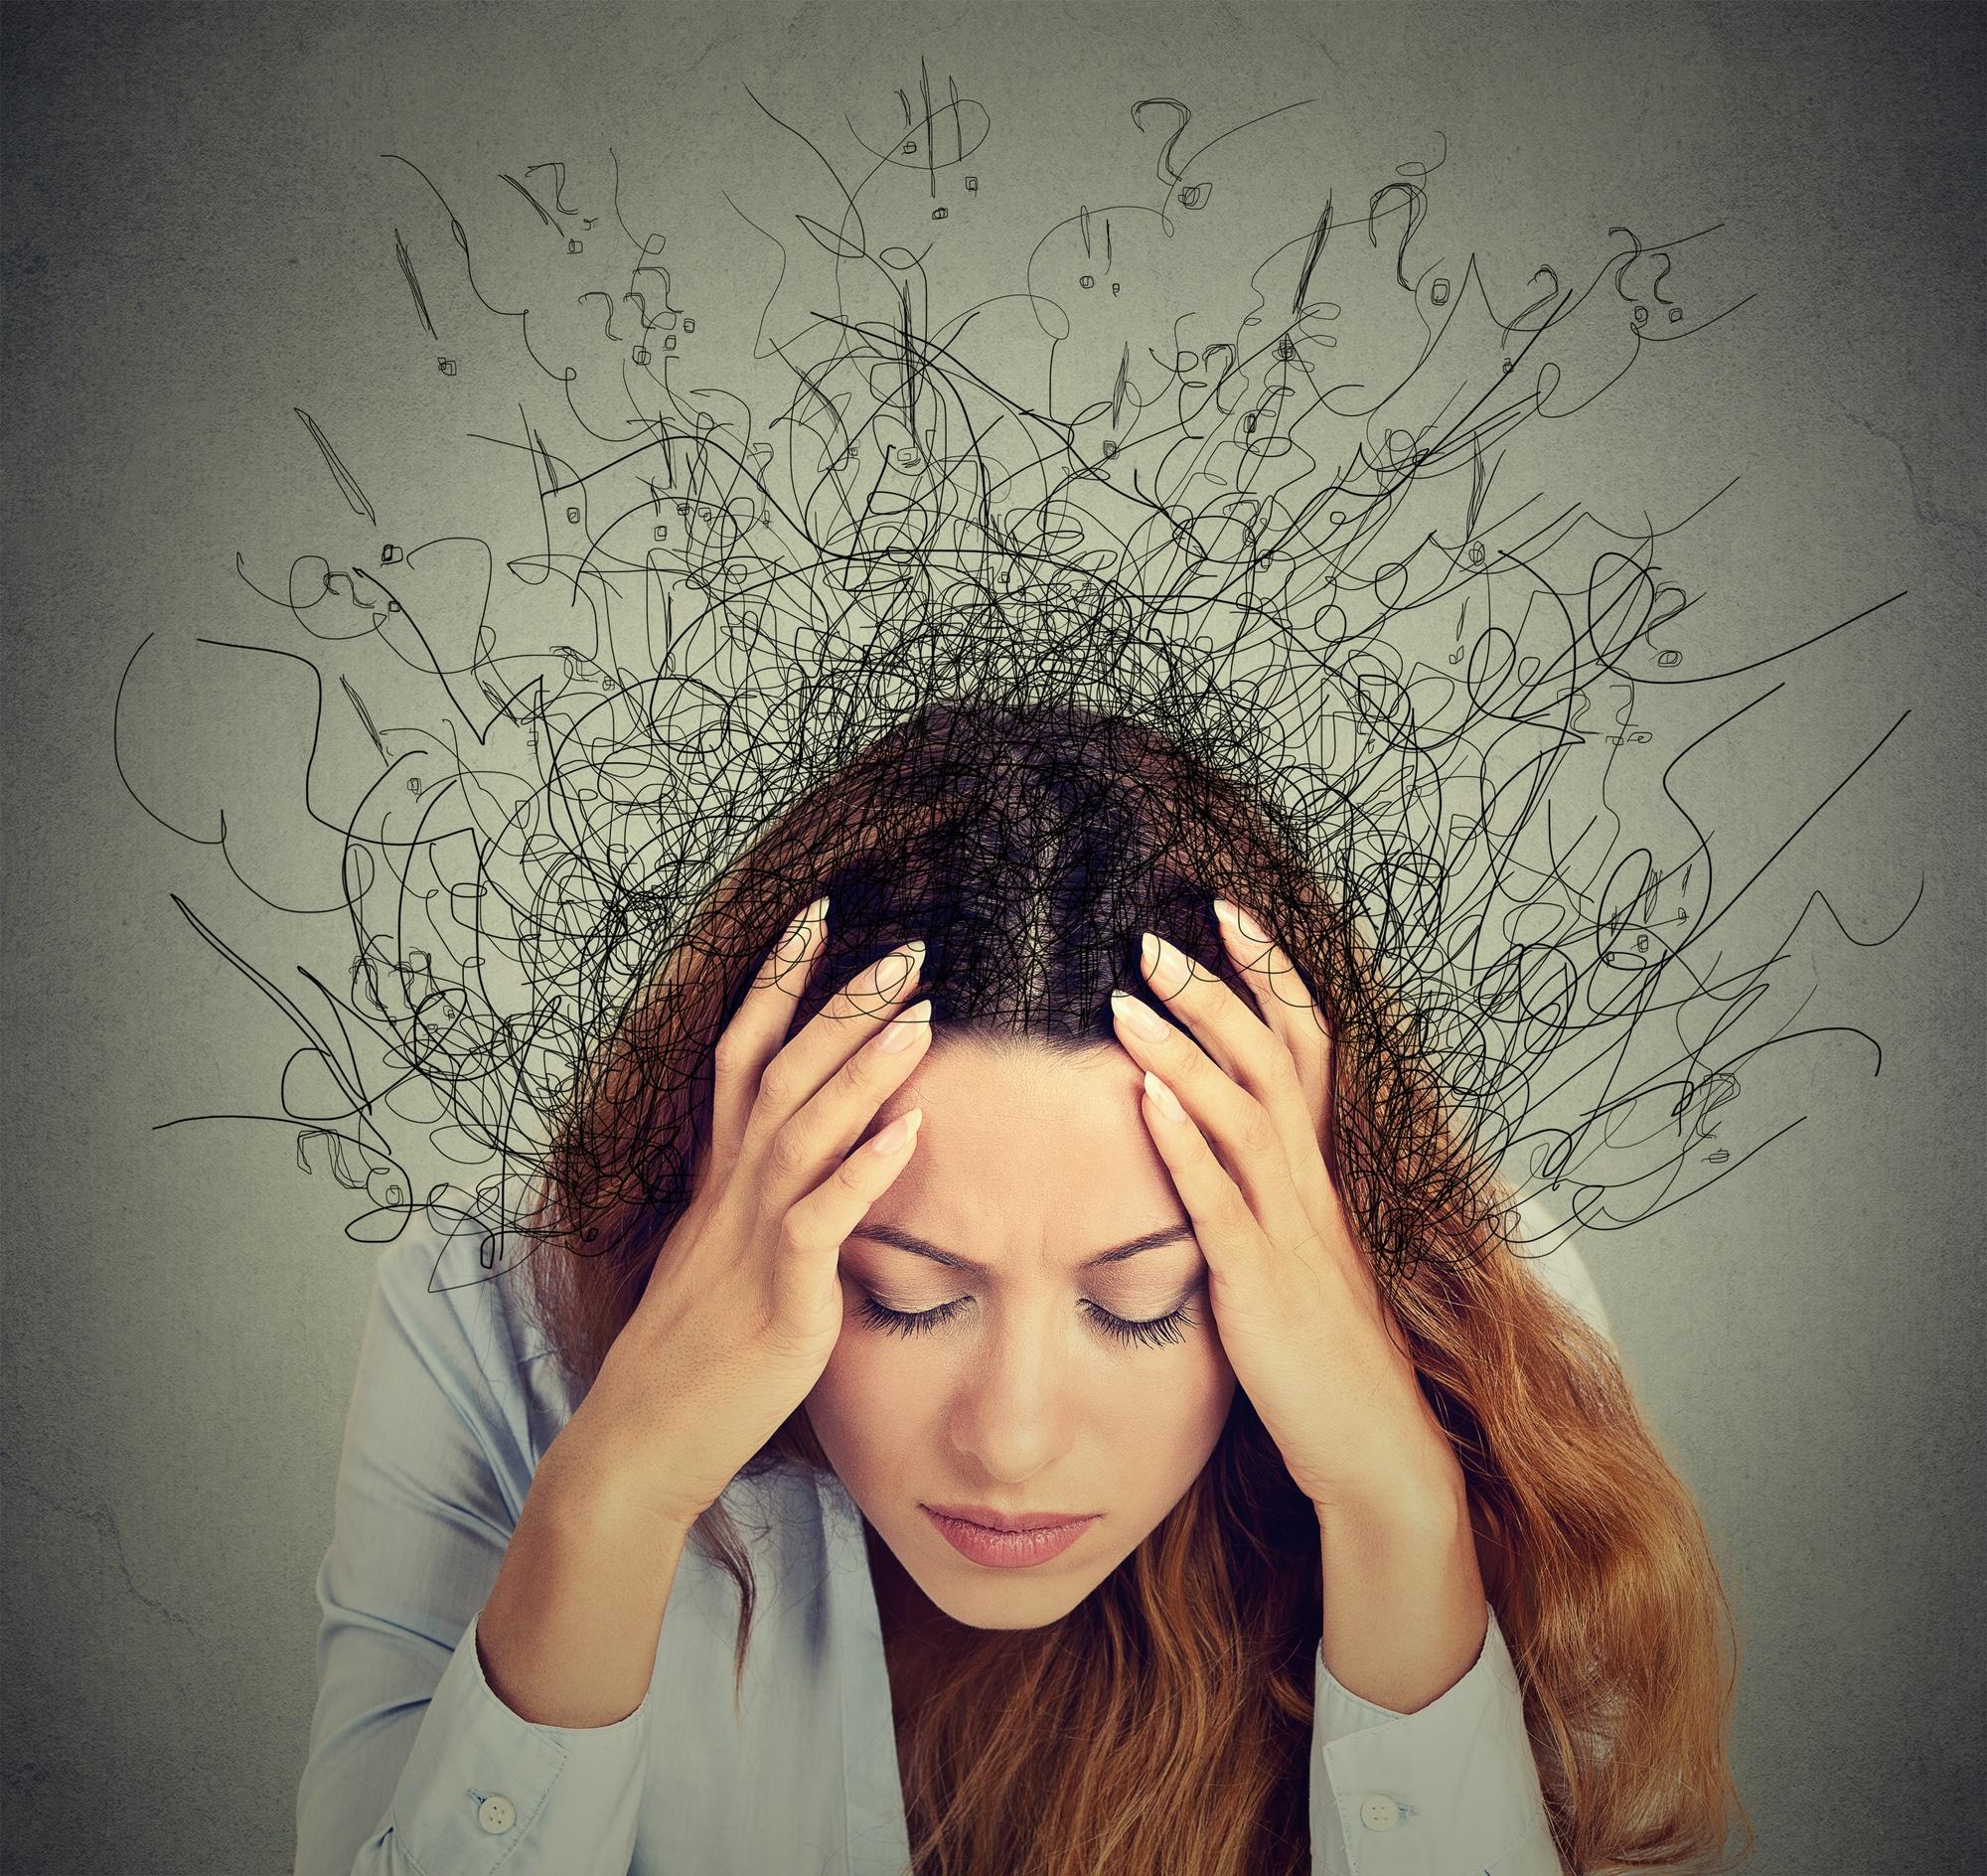 Woman feeling anxious